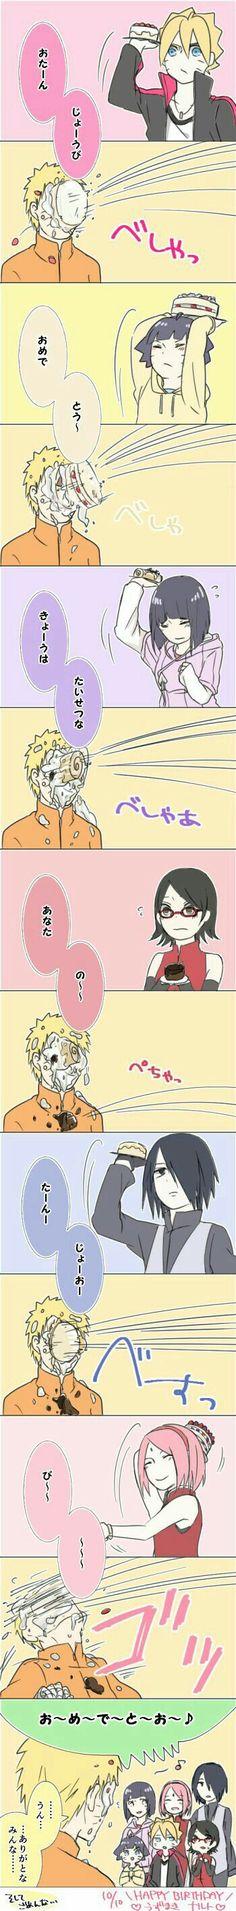 Happy Birthday Naruto, Boruto, Himawari, Hinata, Sasuke, Sakura, Sarada, Uzumaki family, Uchiha family, funny, text, comic, cake; Boruto